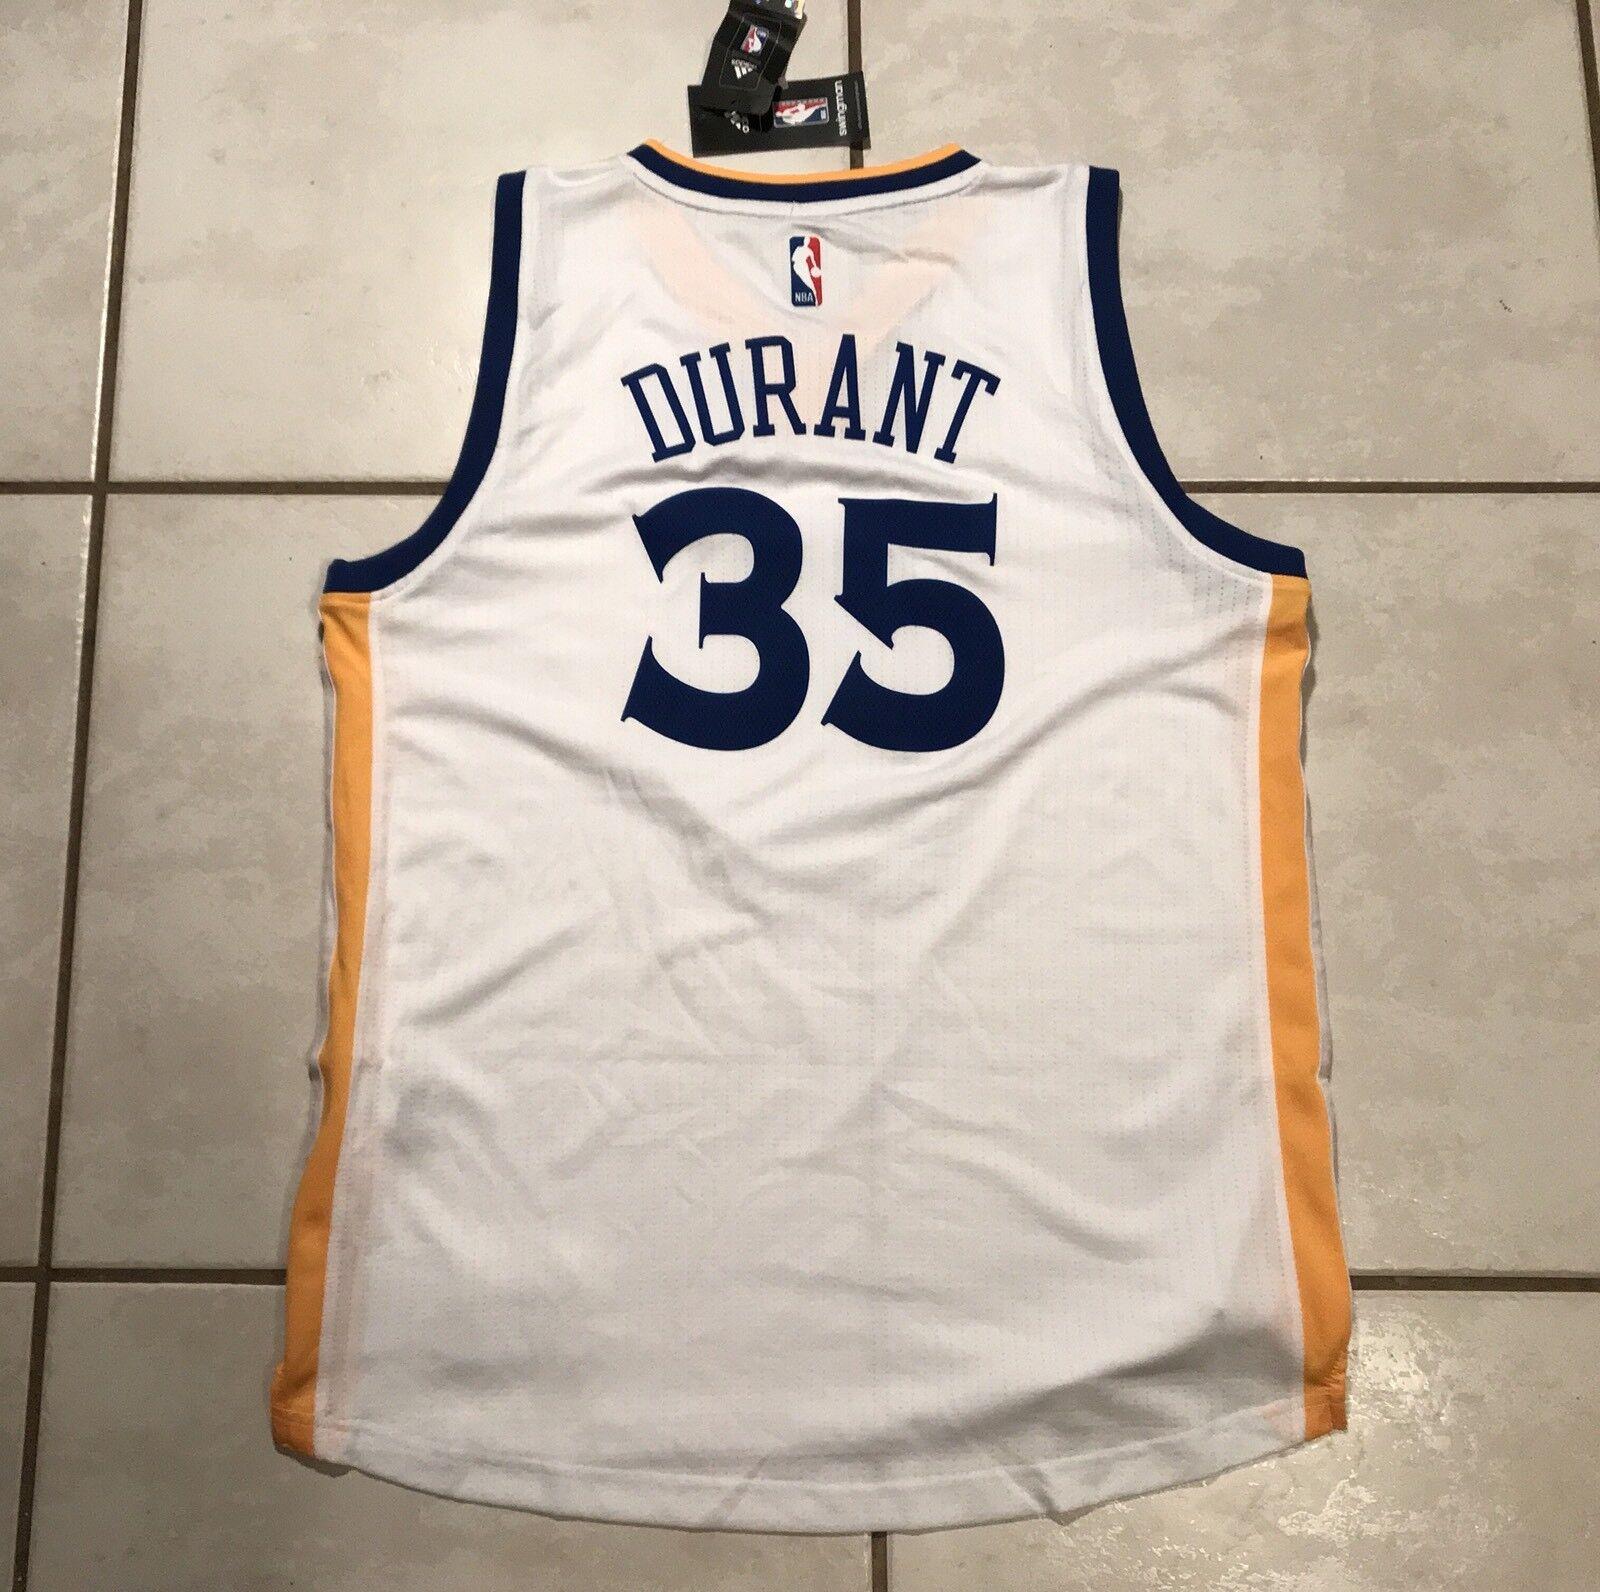 low priced b46c8 24c68 adidas NBA Golden State Warriors Kevin Durant Jersey Swingman L 35 White  Nike